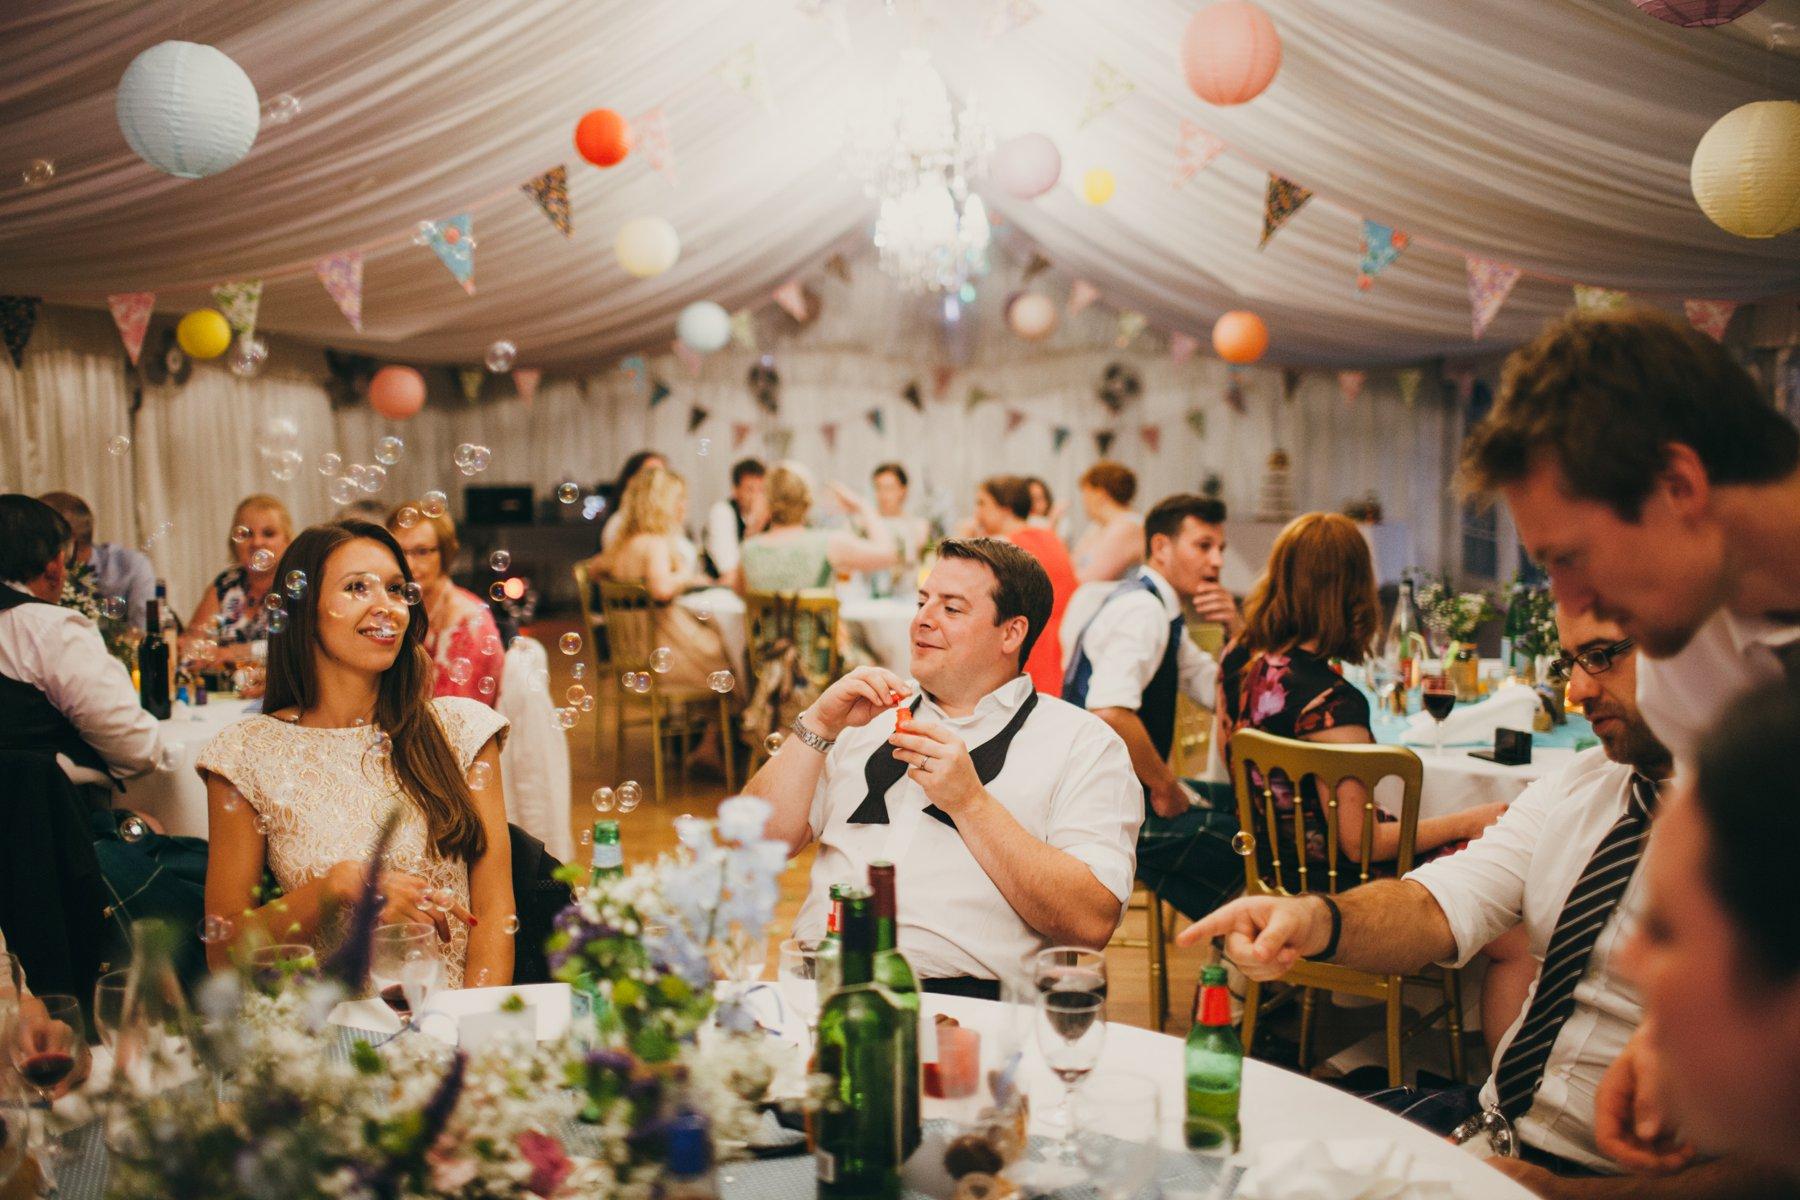 petitmoulin_france_bordeaux_weddings_0127